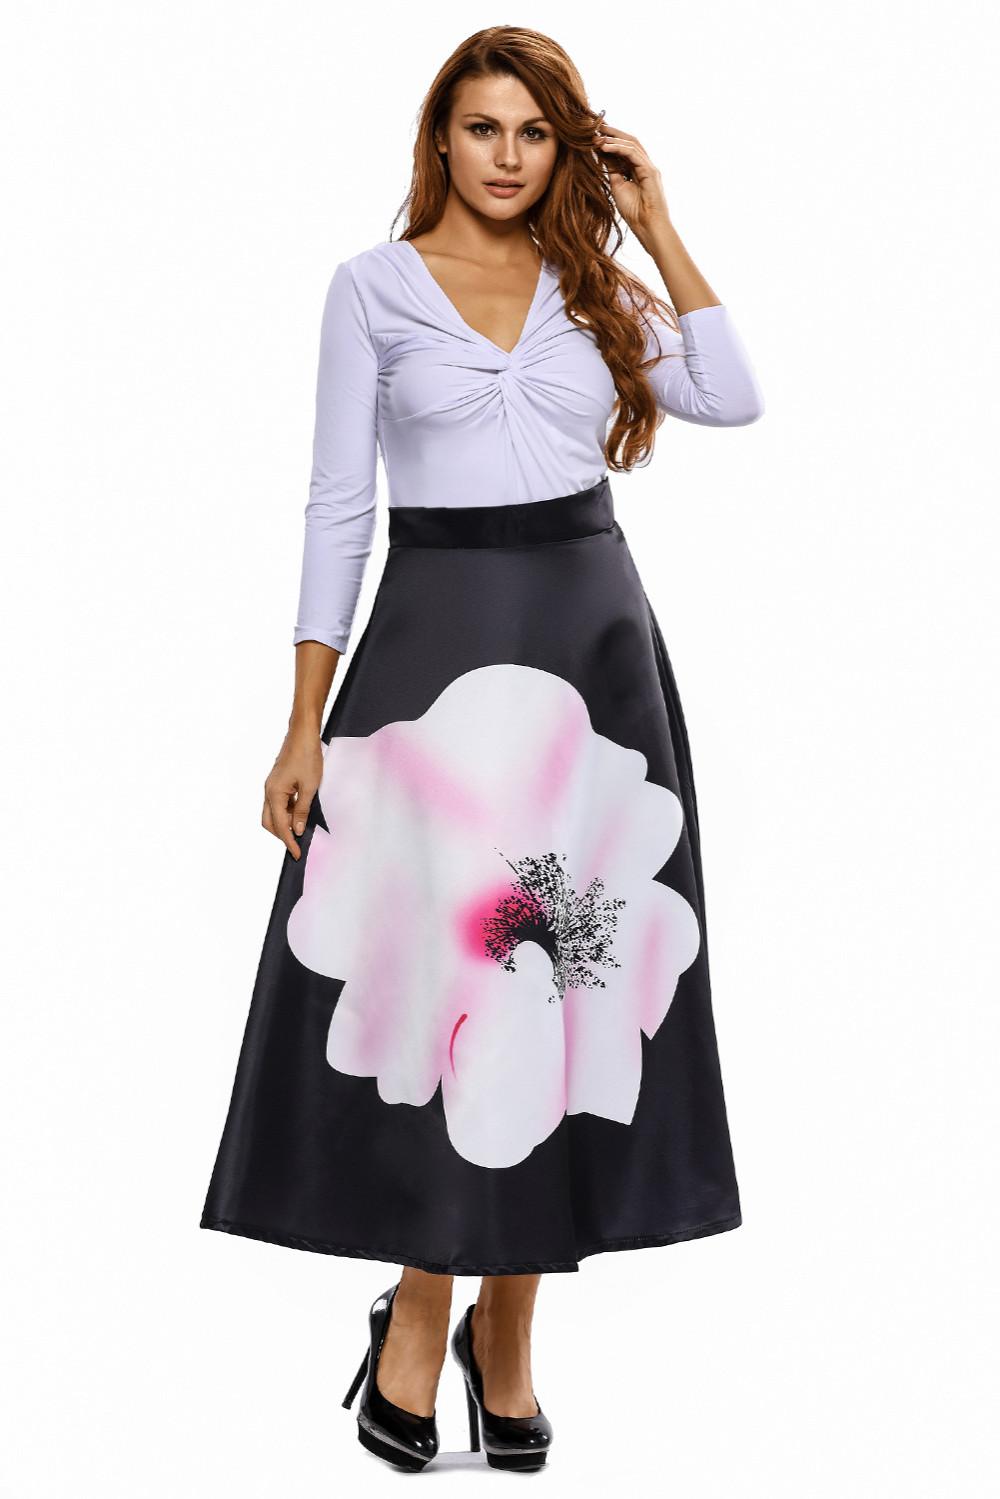 Big-Flower-Print-Black-High-Waist-Maxi-Skirt-LC65017-2-5